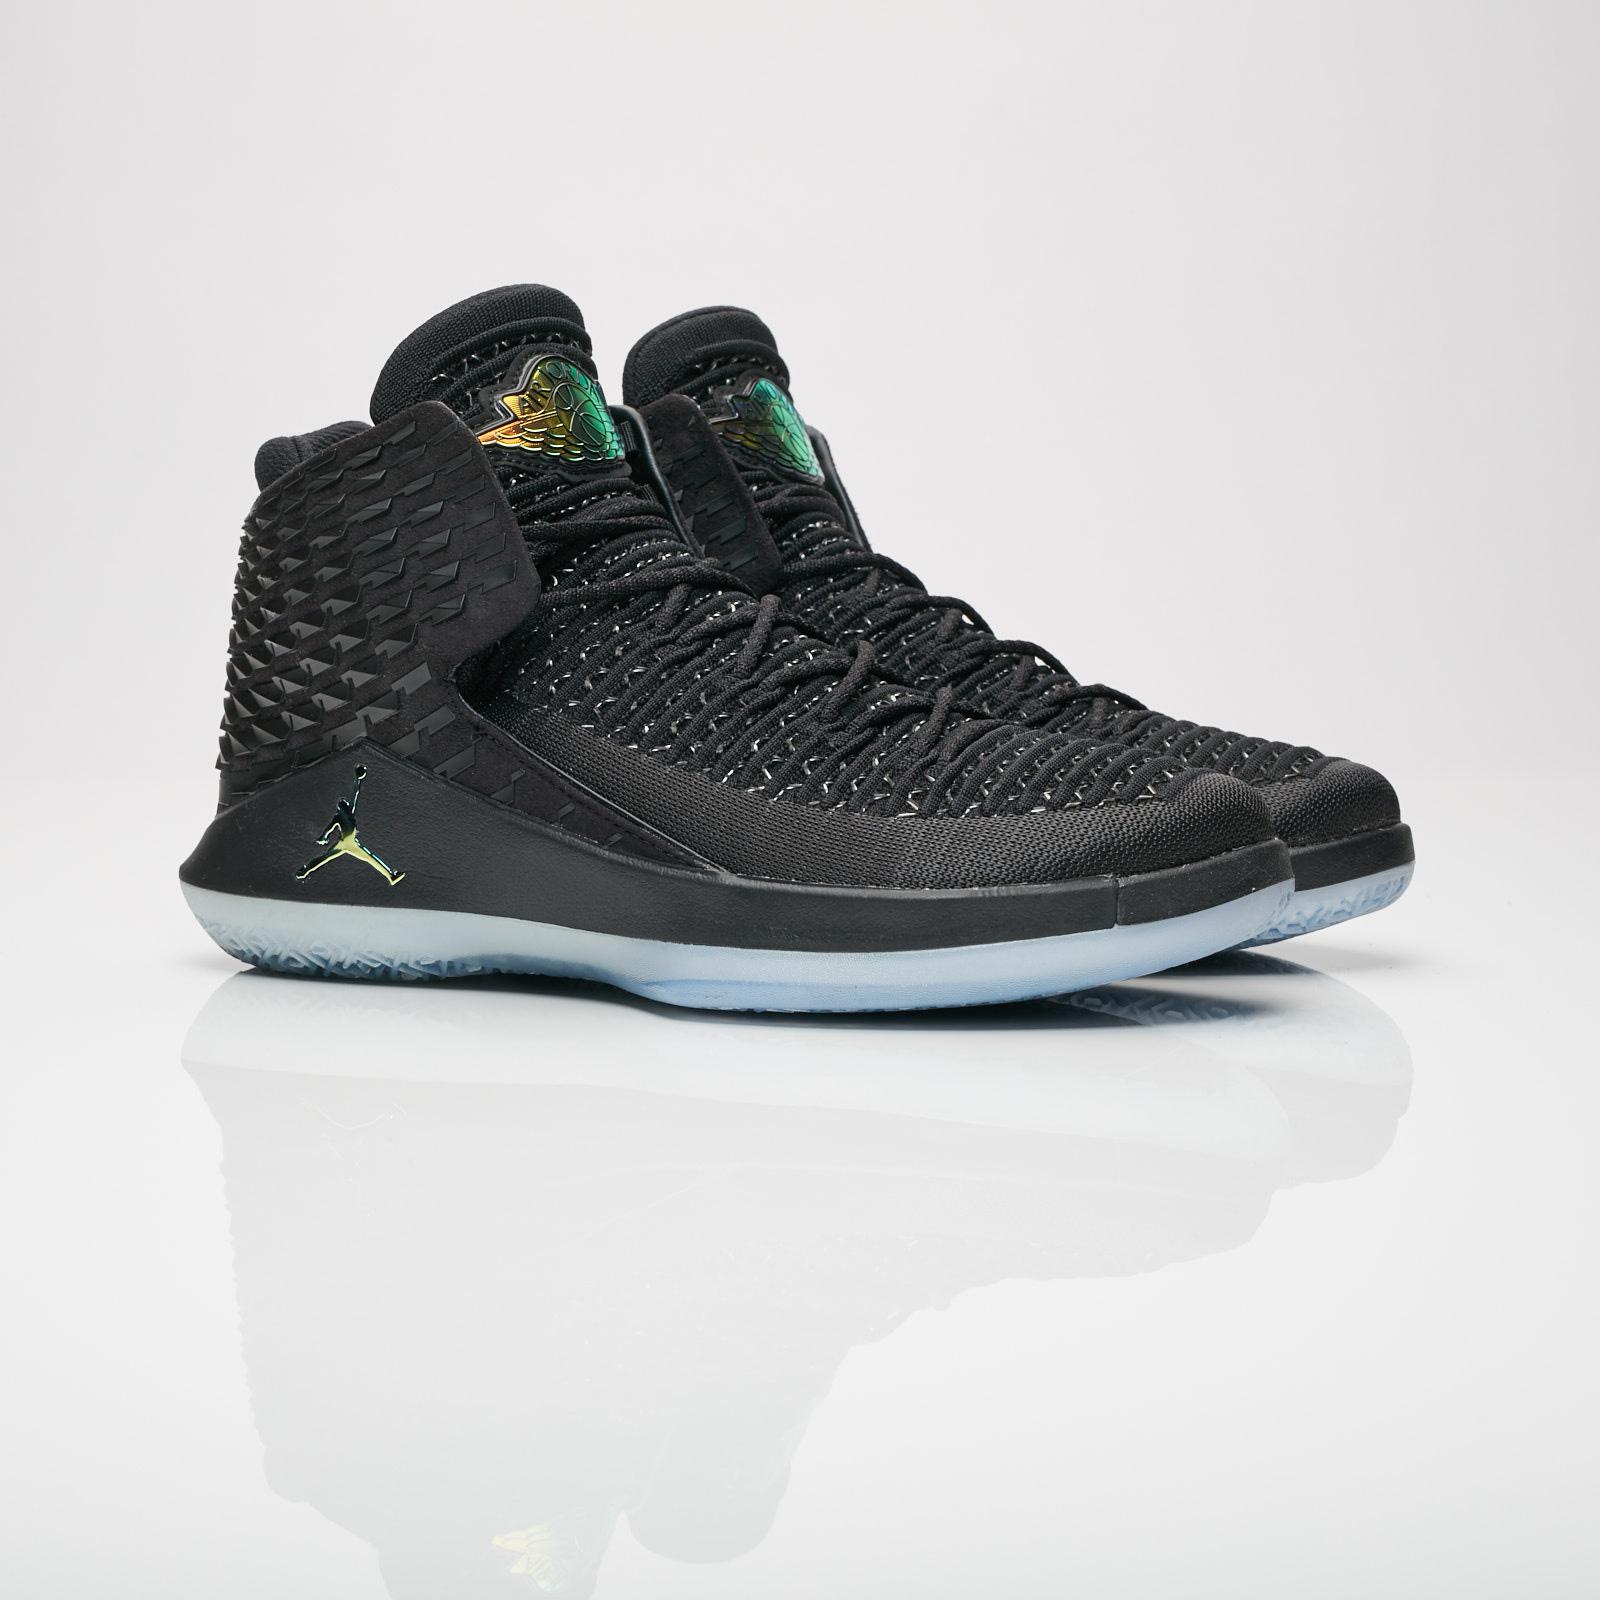 cheaper 46bc1 07309 Jordan Brand Air Jordan XXXII